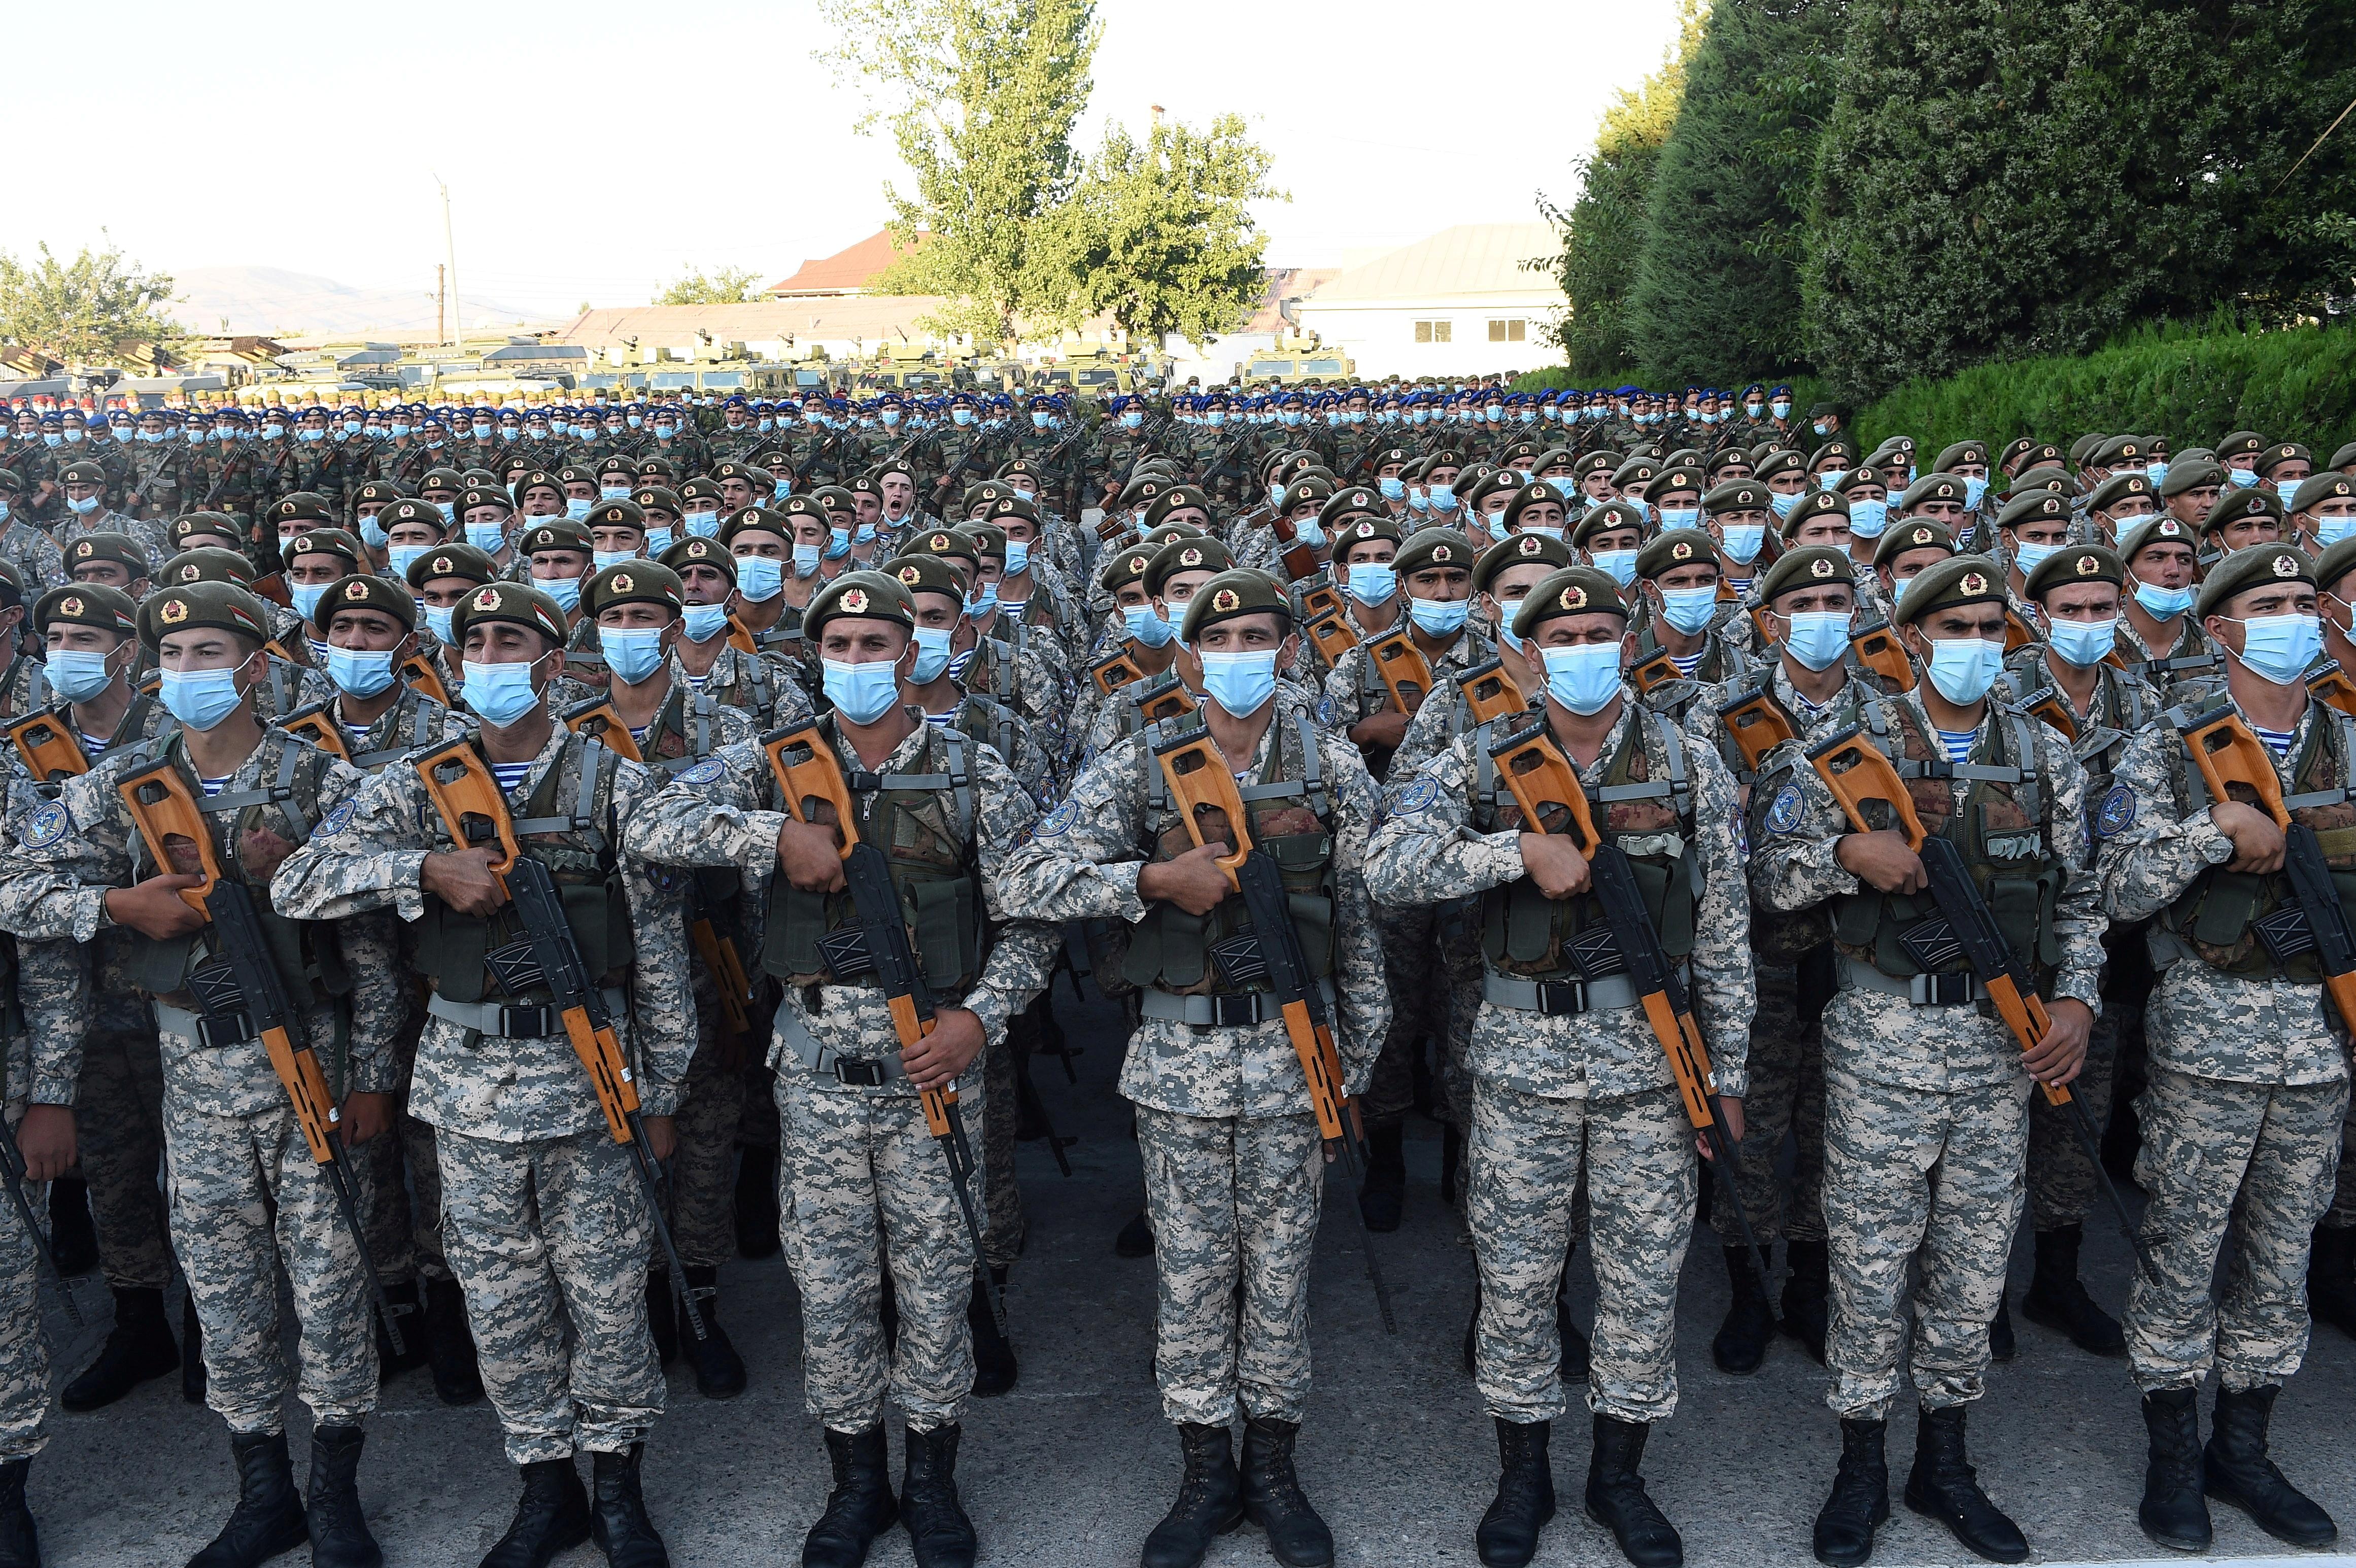 Tajik service members line up during a parade following a nationwide military exercise, in Dushanbe, Tajikistan July 22, 2021. Tajik Presidential Press Service/Handout via REUTERS